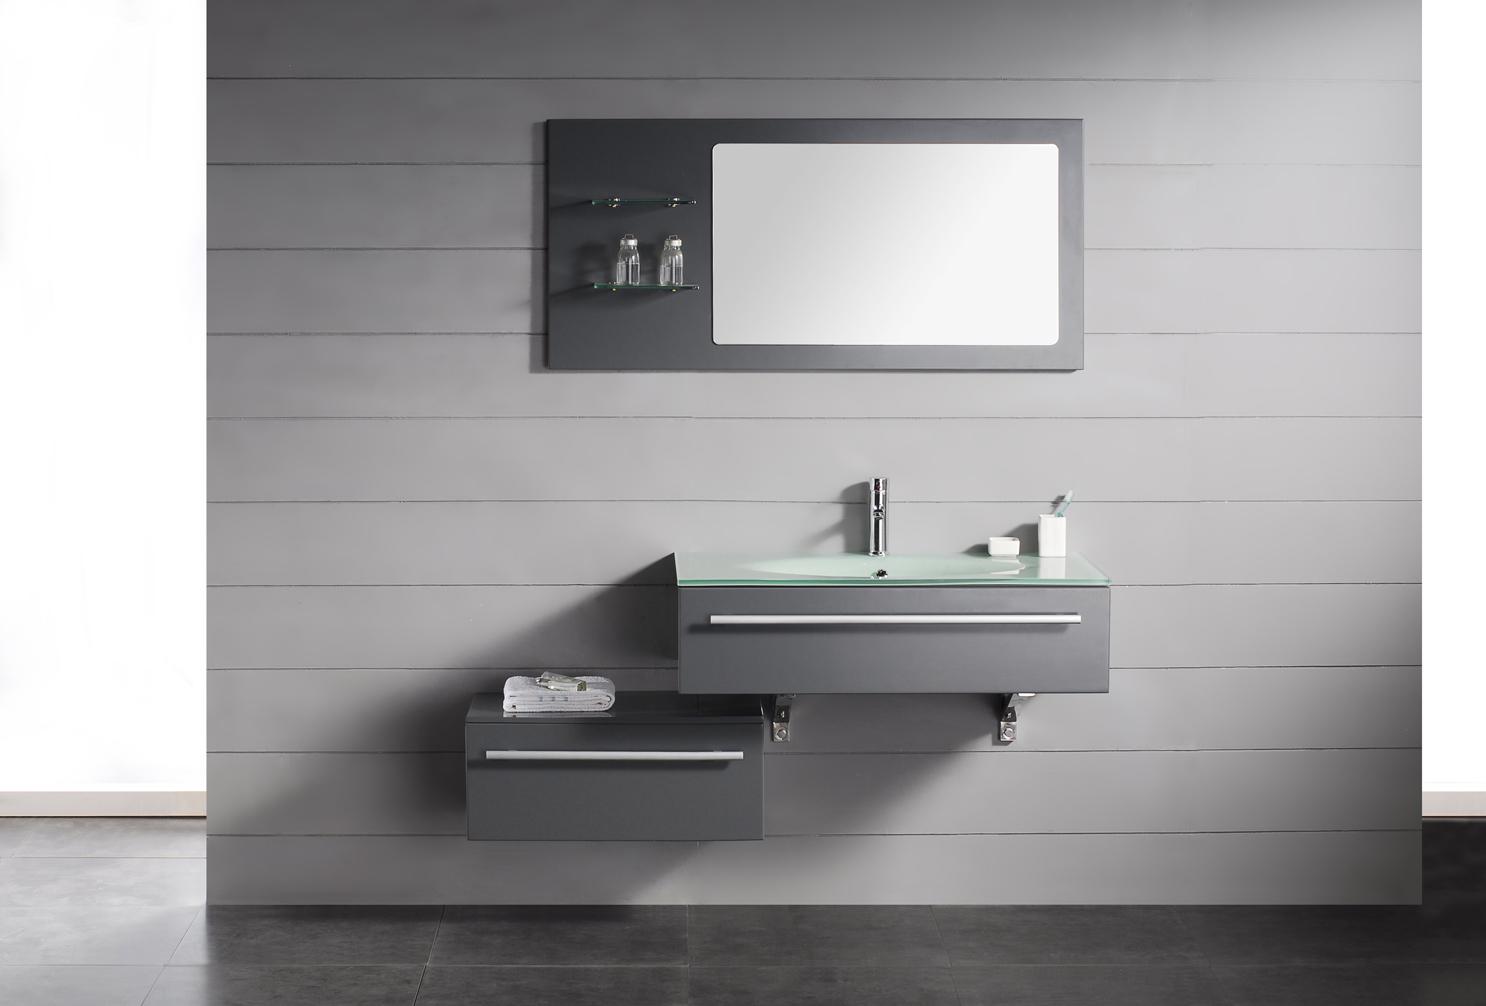 modern bathroom vanities click to see larger image. loading zoom. modern bathroom vanity ... RVEFGYE